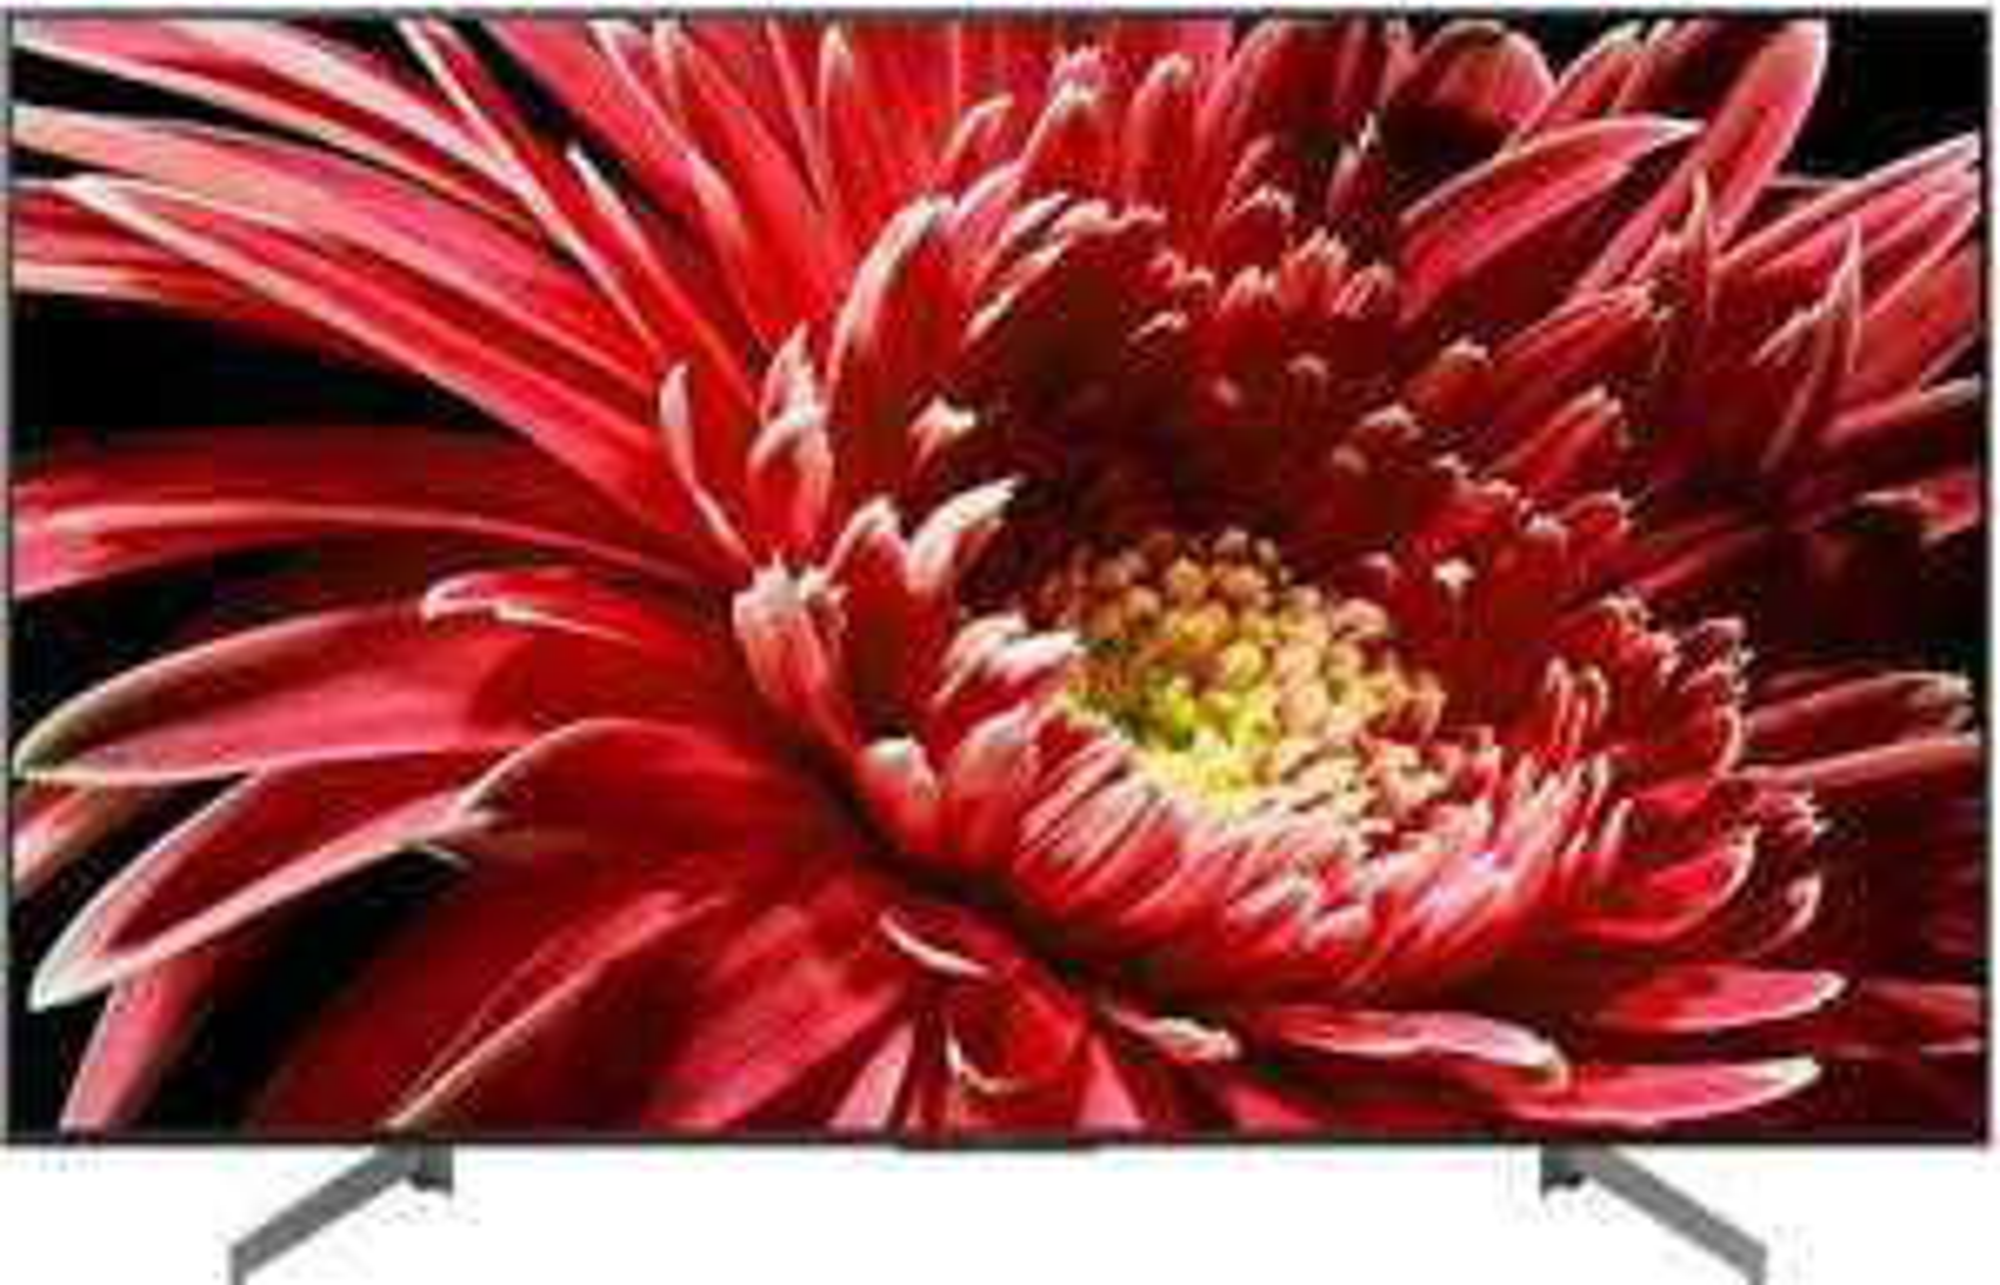 Expert Coburg Neueröffnung   z.B. Sony KD-55XG8599 Fernseher (55 Zoll, 4K, HDR, 1000Hz)